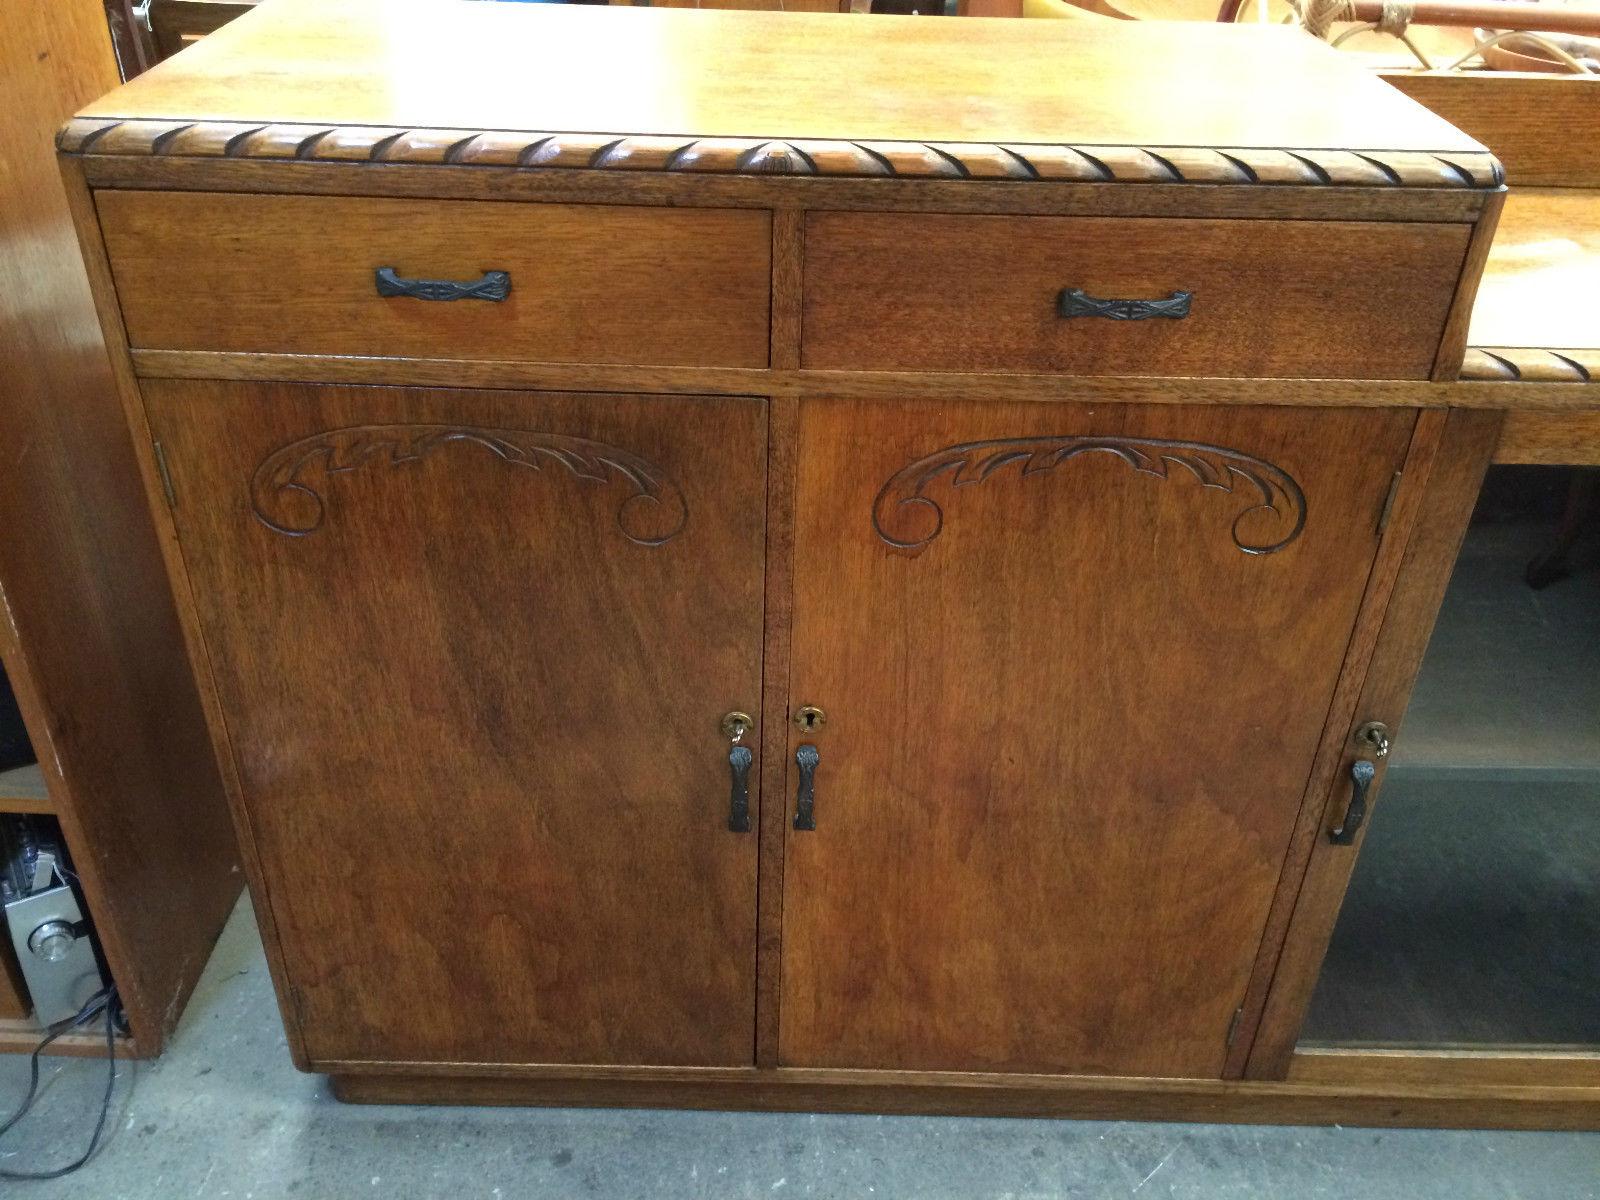 Antique Art Deco 2 Tier Sideboard Buffet | Melbourne | Halsey Road Recyclers